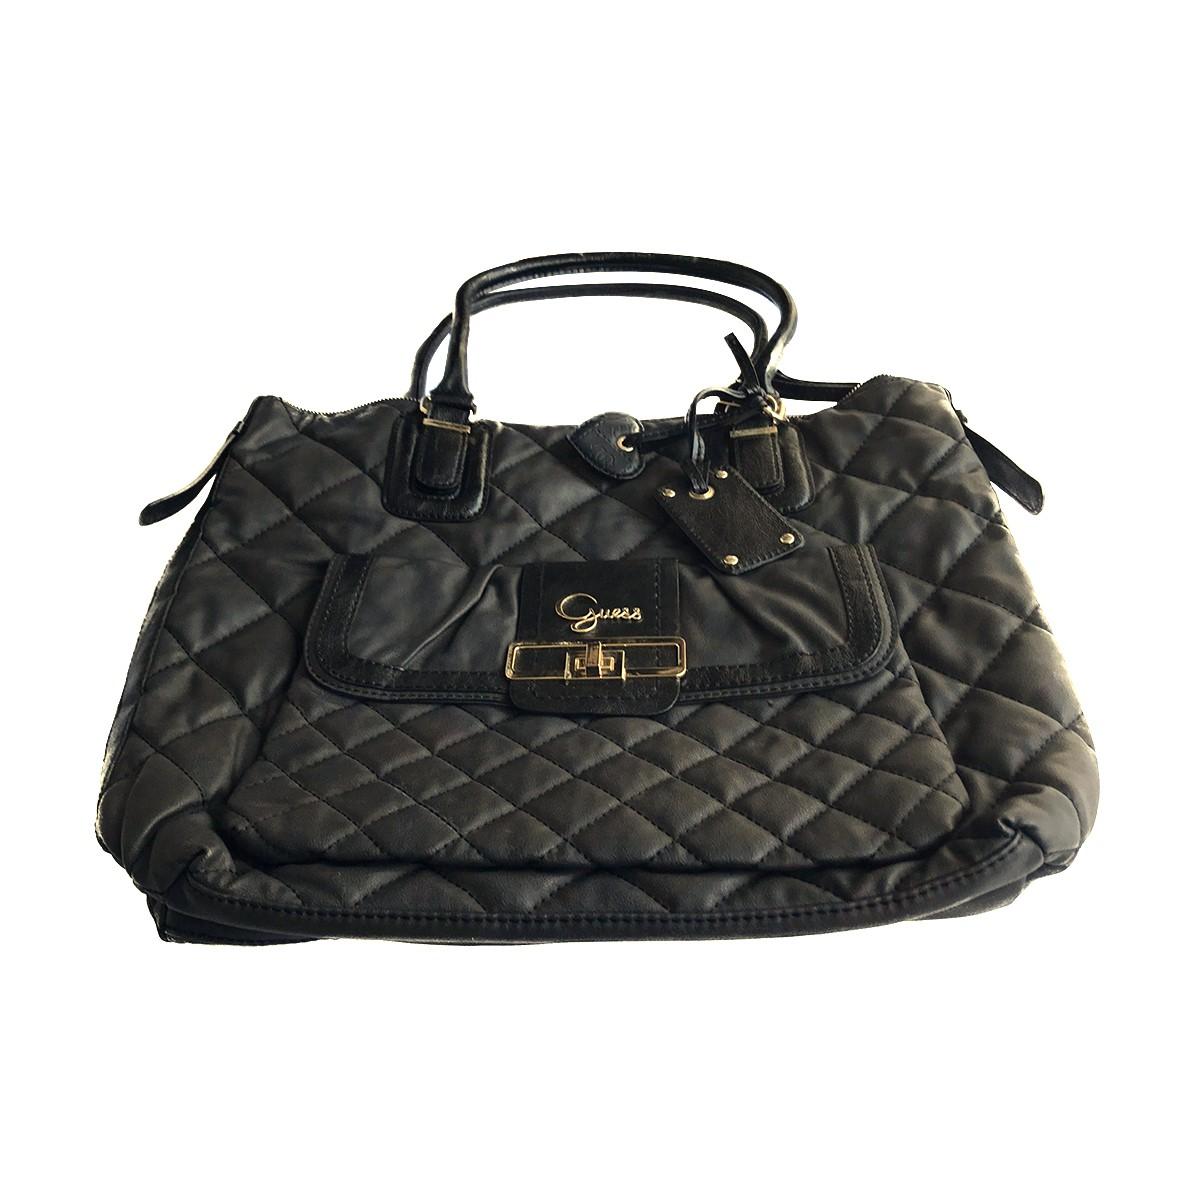 Guess Dark Brown handbag - Women  a08f62b2e0dfb